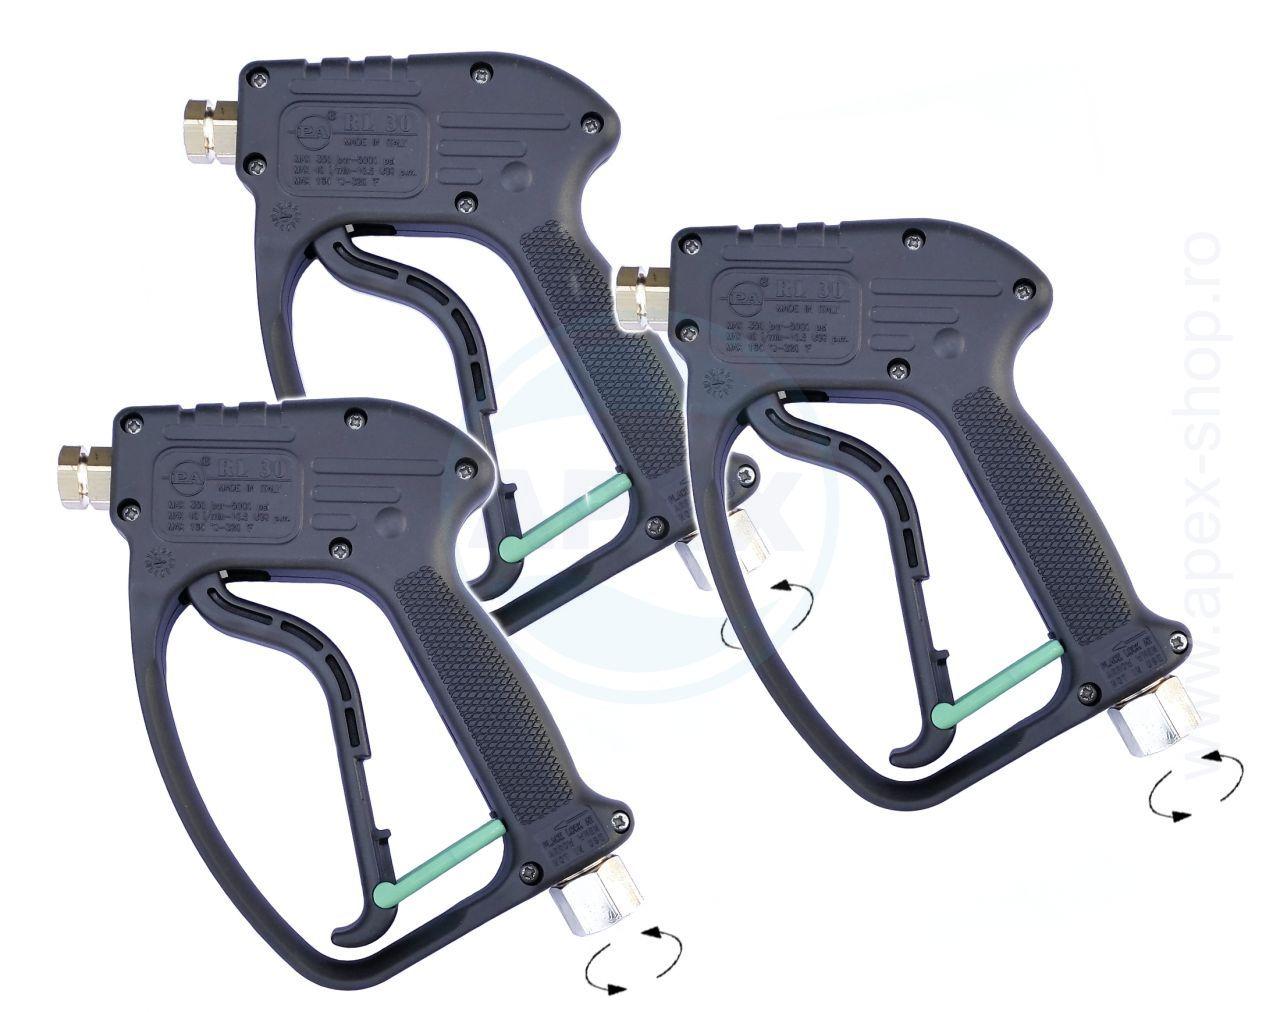 Pistol Jet RL30 Weep Gun, cupla rotativa, 3buc